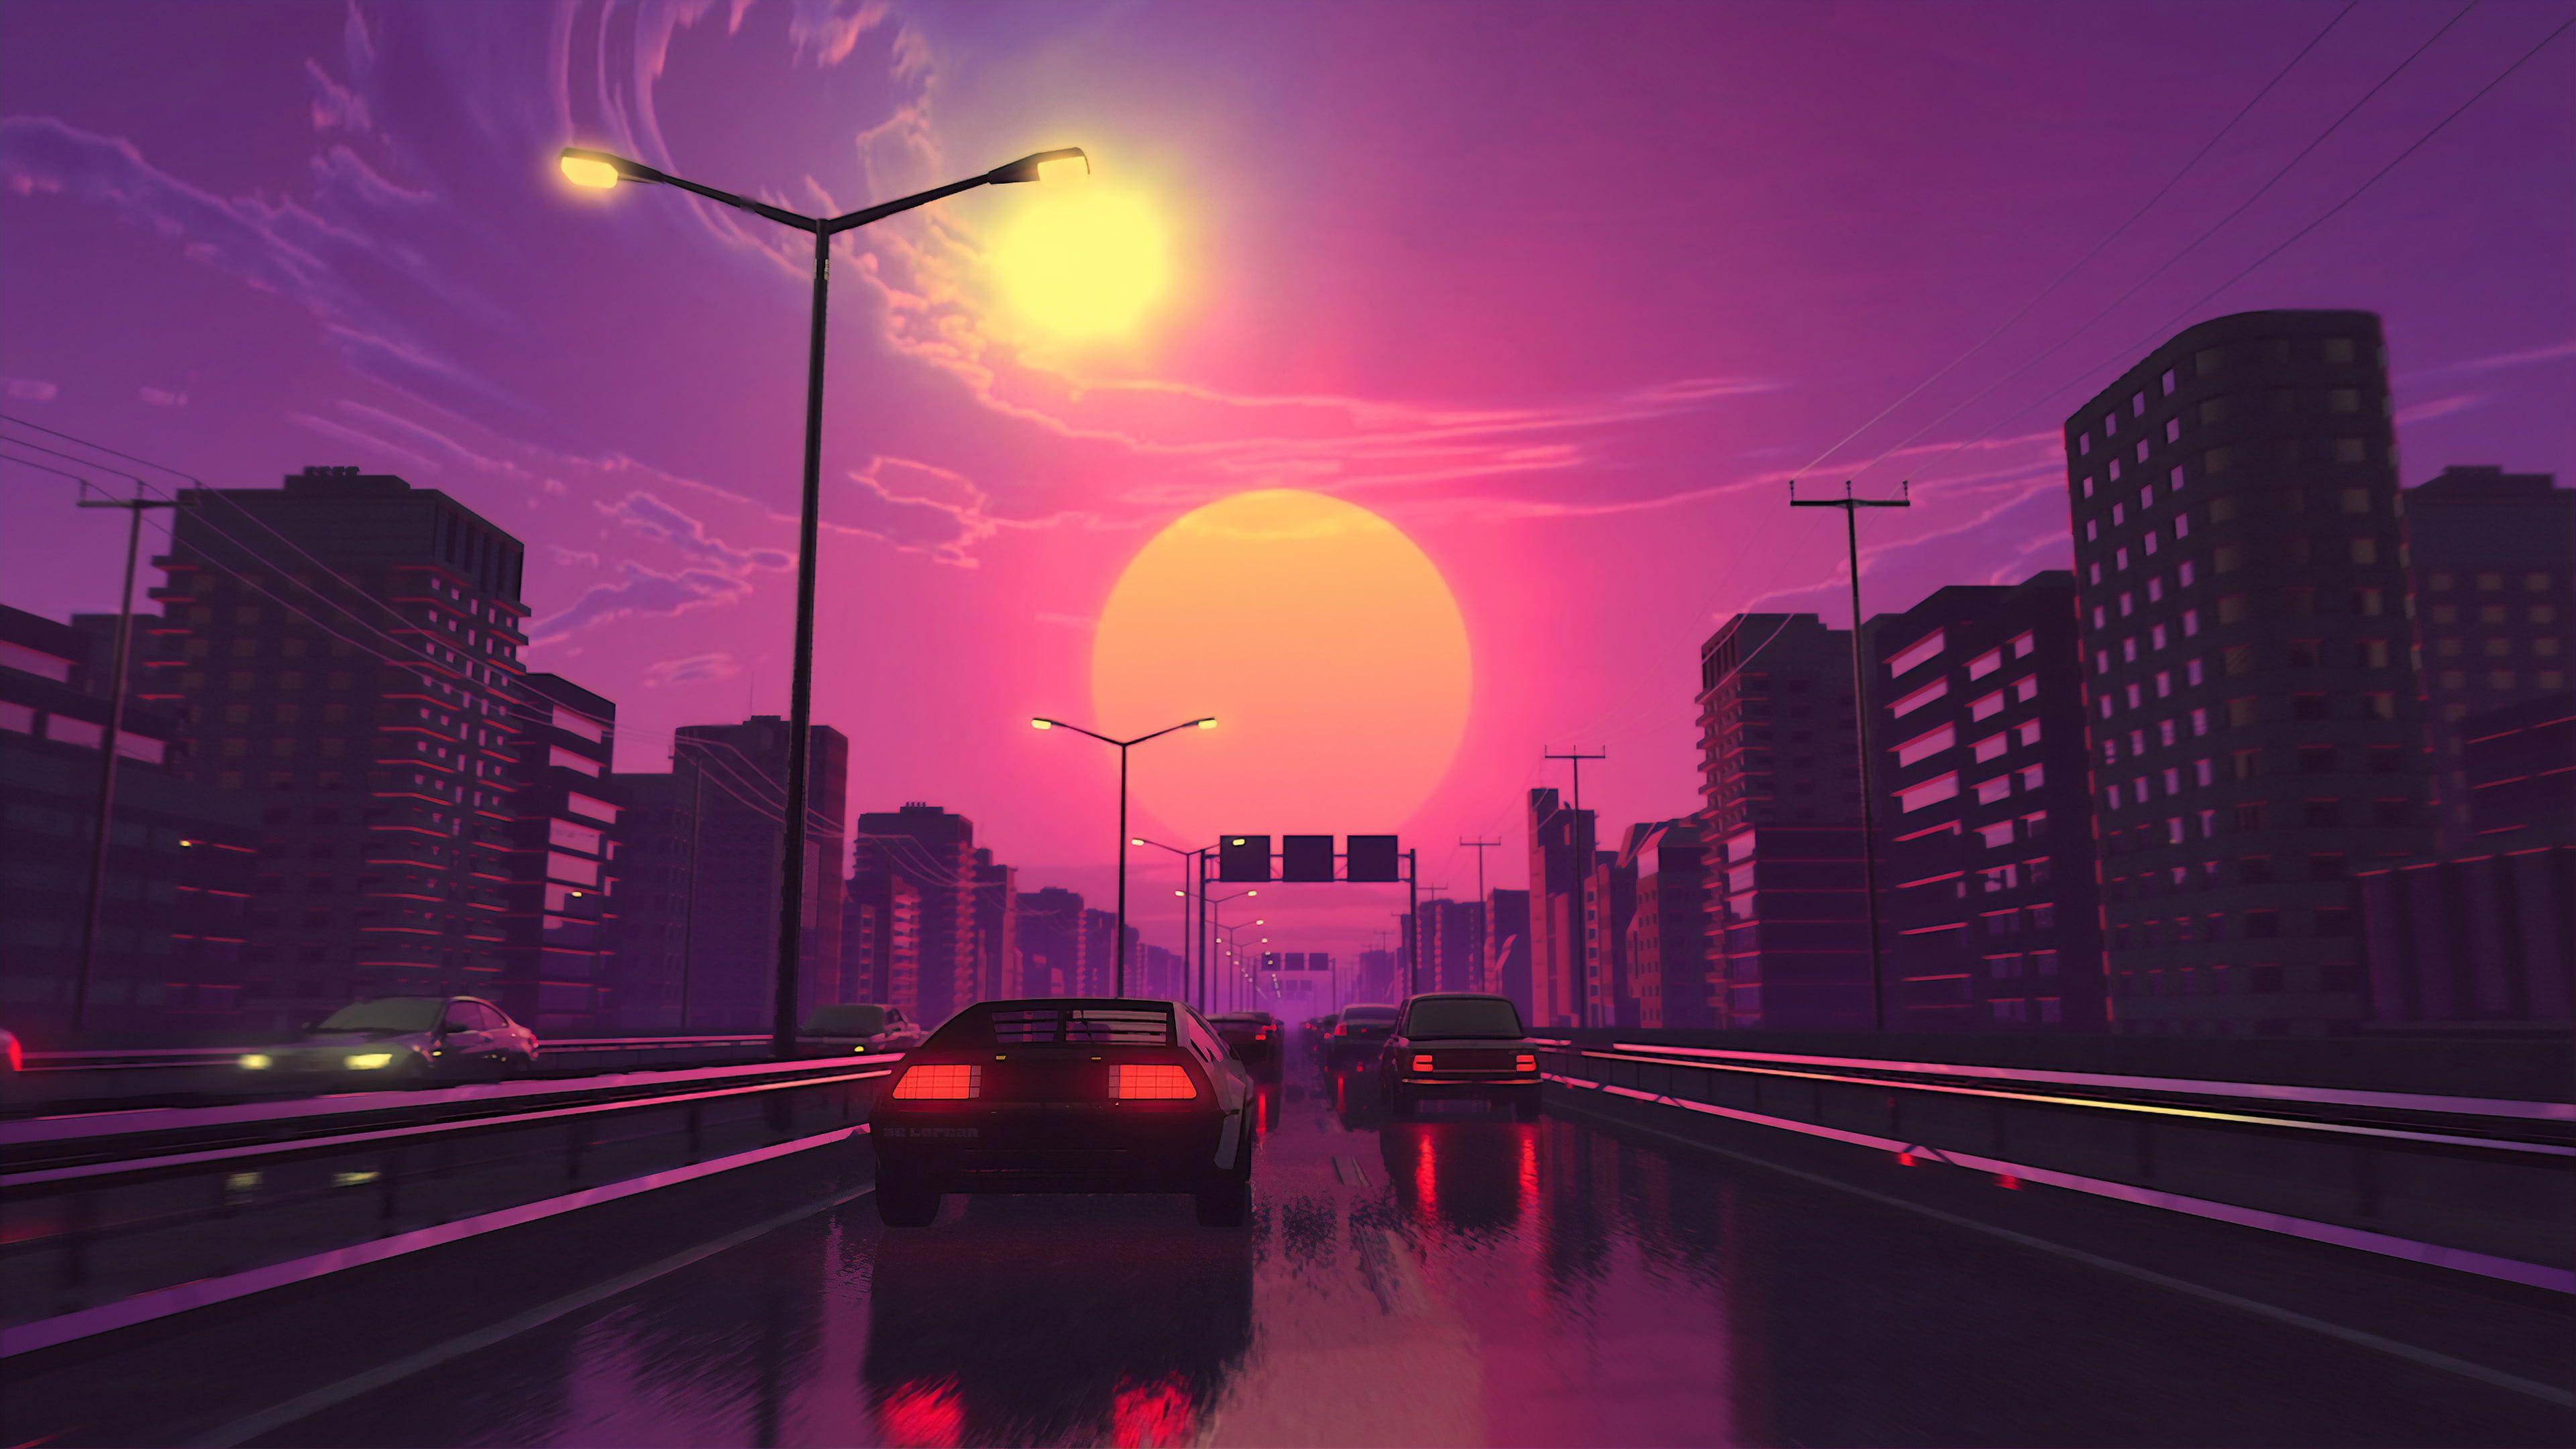 Digital Digital Art Artwork City Lights Street Car Wallpaper Vehicle City Wallpaper Vaporwave Wallpaper Skyscape